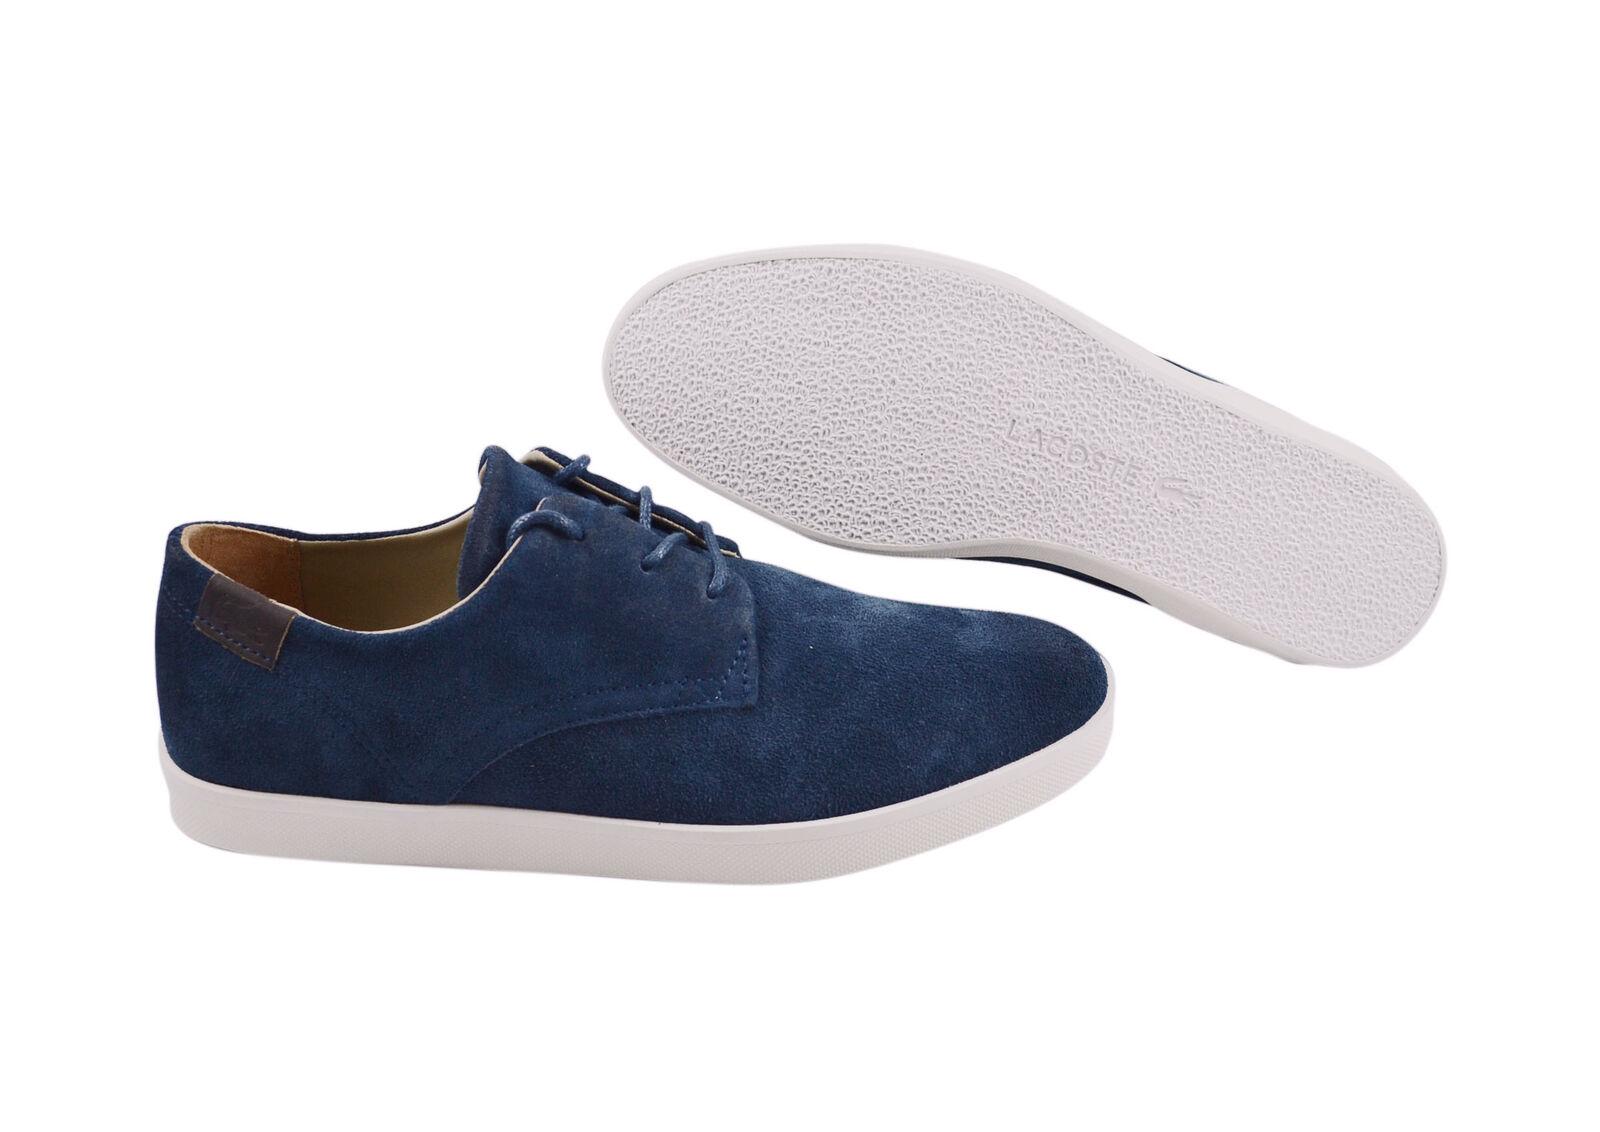 Lacoste Zimri 3 SRM dark blue Leder Schuhe/Sneaker Größenauswahl!!